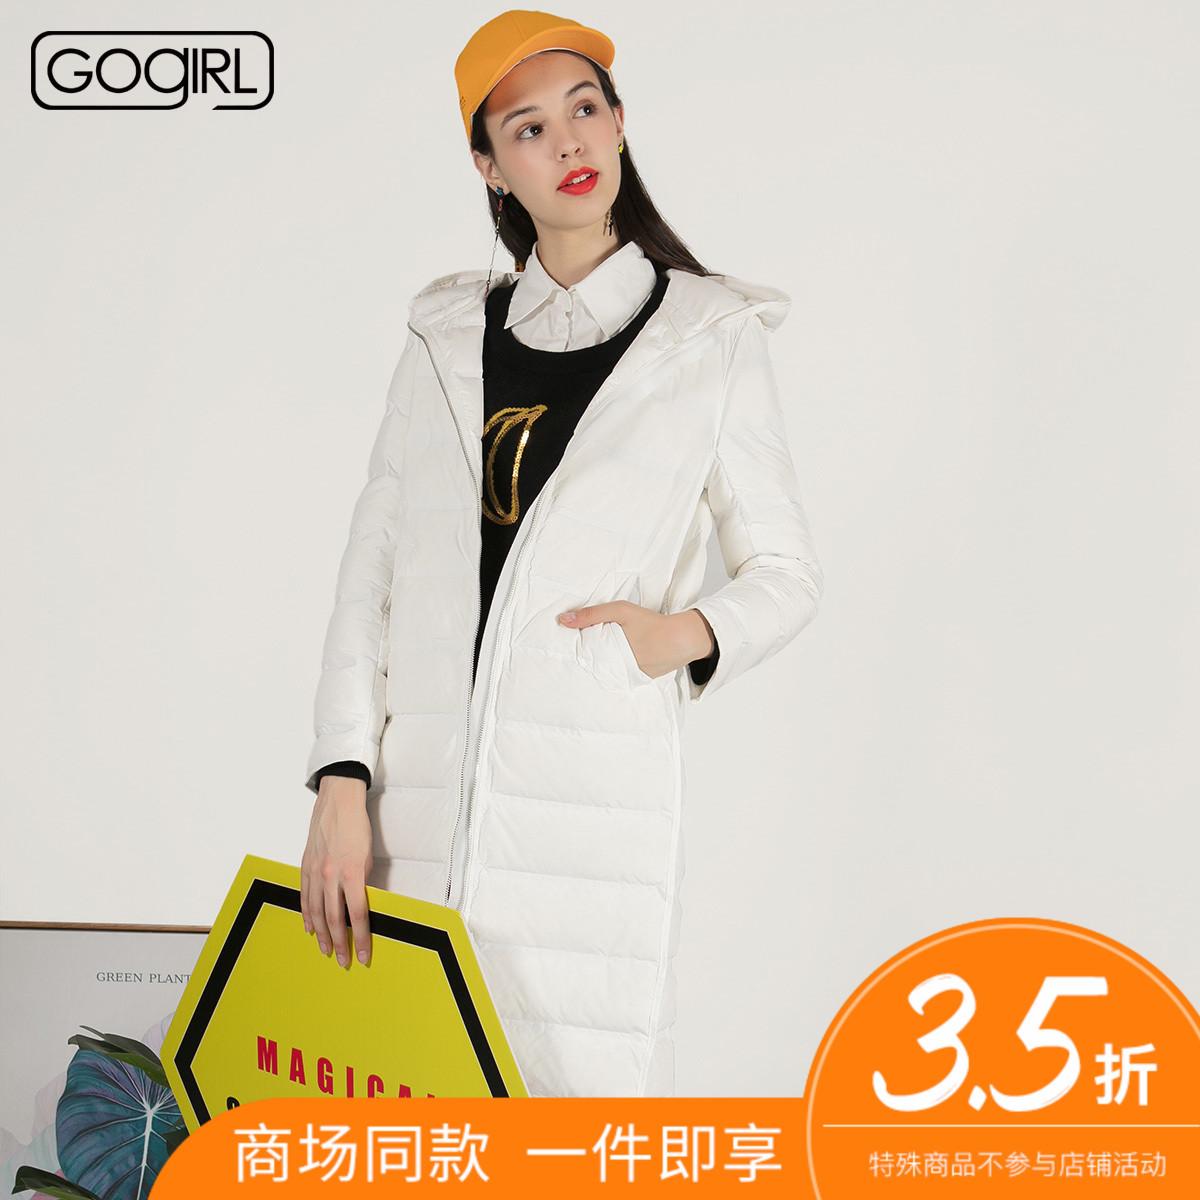 GOGIRL2017专柜时尚新款学院风休闲中长款羽绒服女 GU4I66